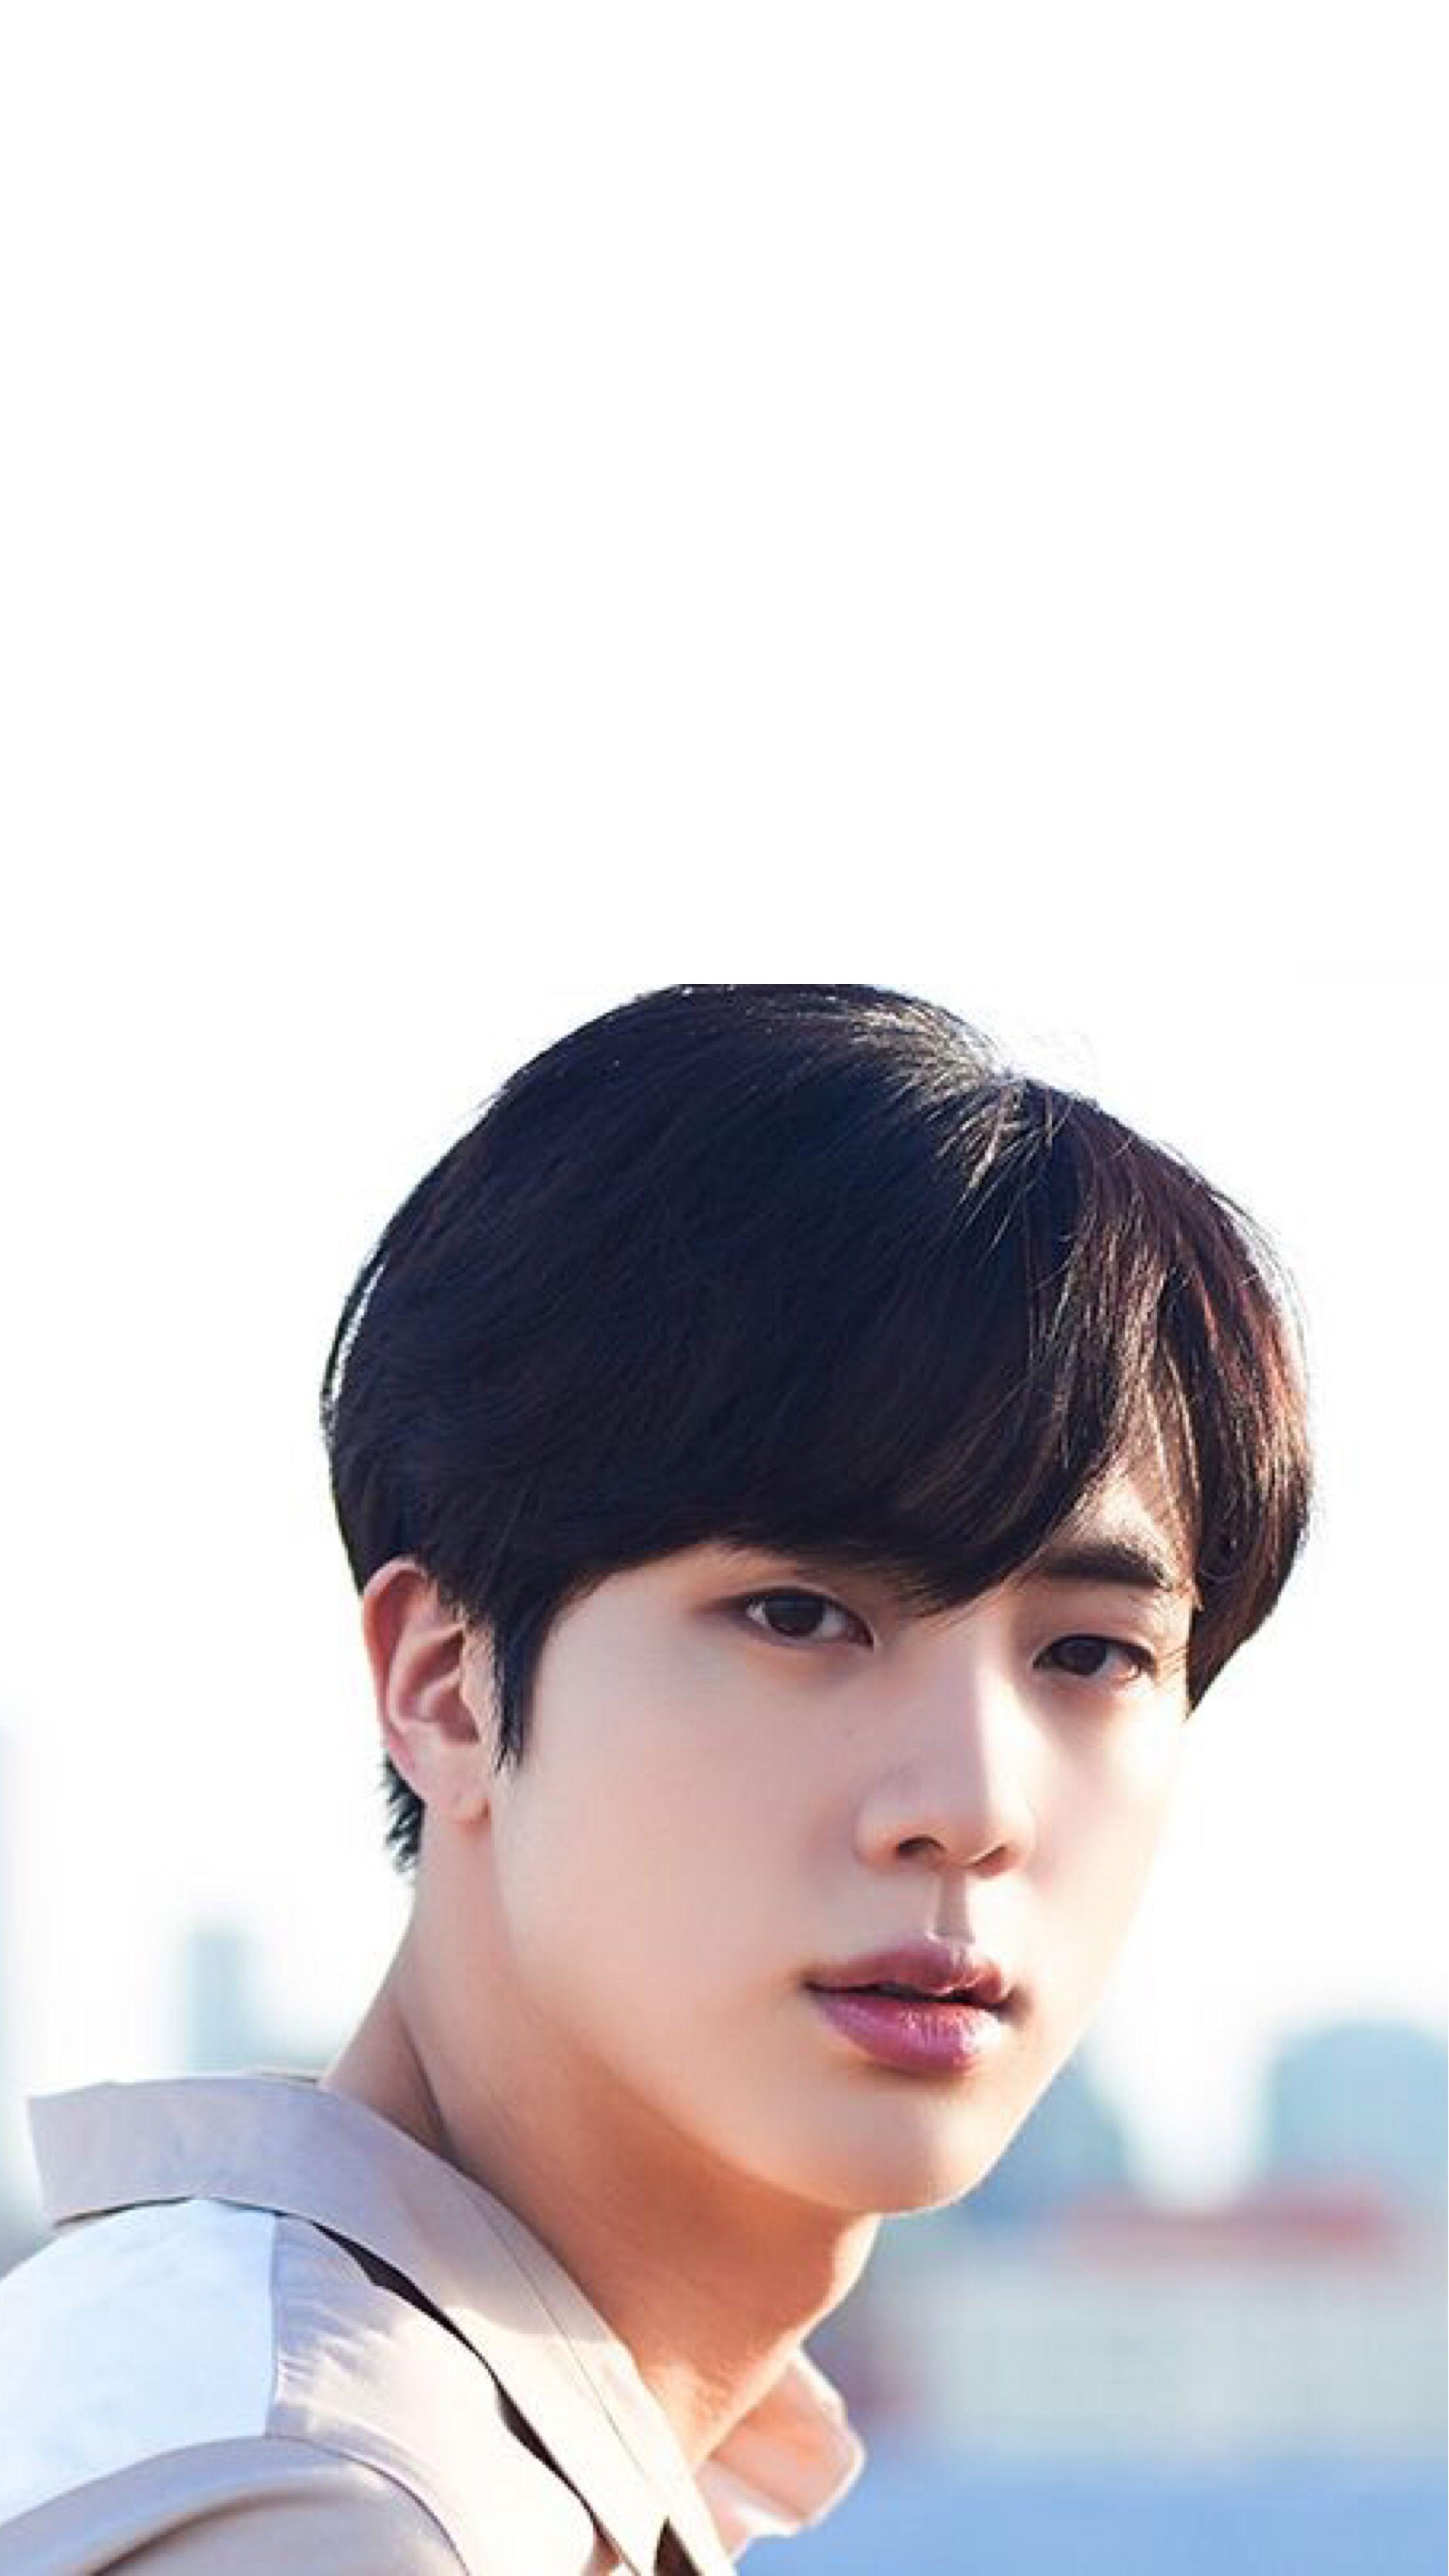 Bts Jin Wallpaper Bts Jin Worldwide Handsome Jin Bts jin wallpaper hd